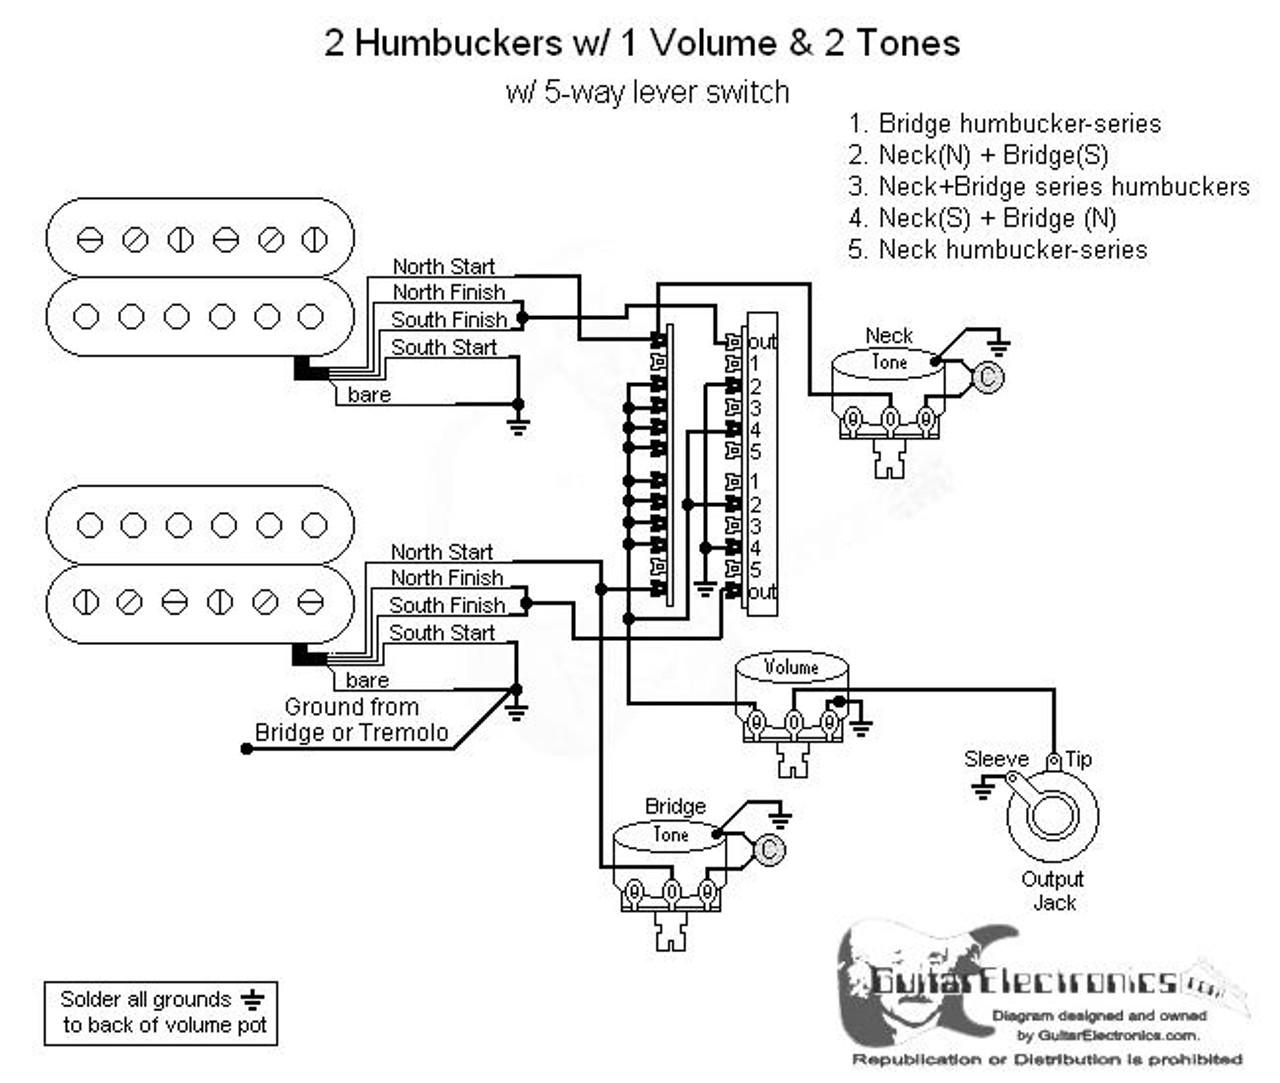 medium resolution of 2 humbuckers 5 way lever switch 1 volume 2 tones 05two humbucker 5 way switch wiring